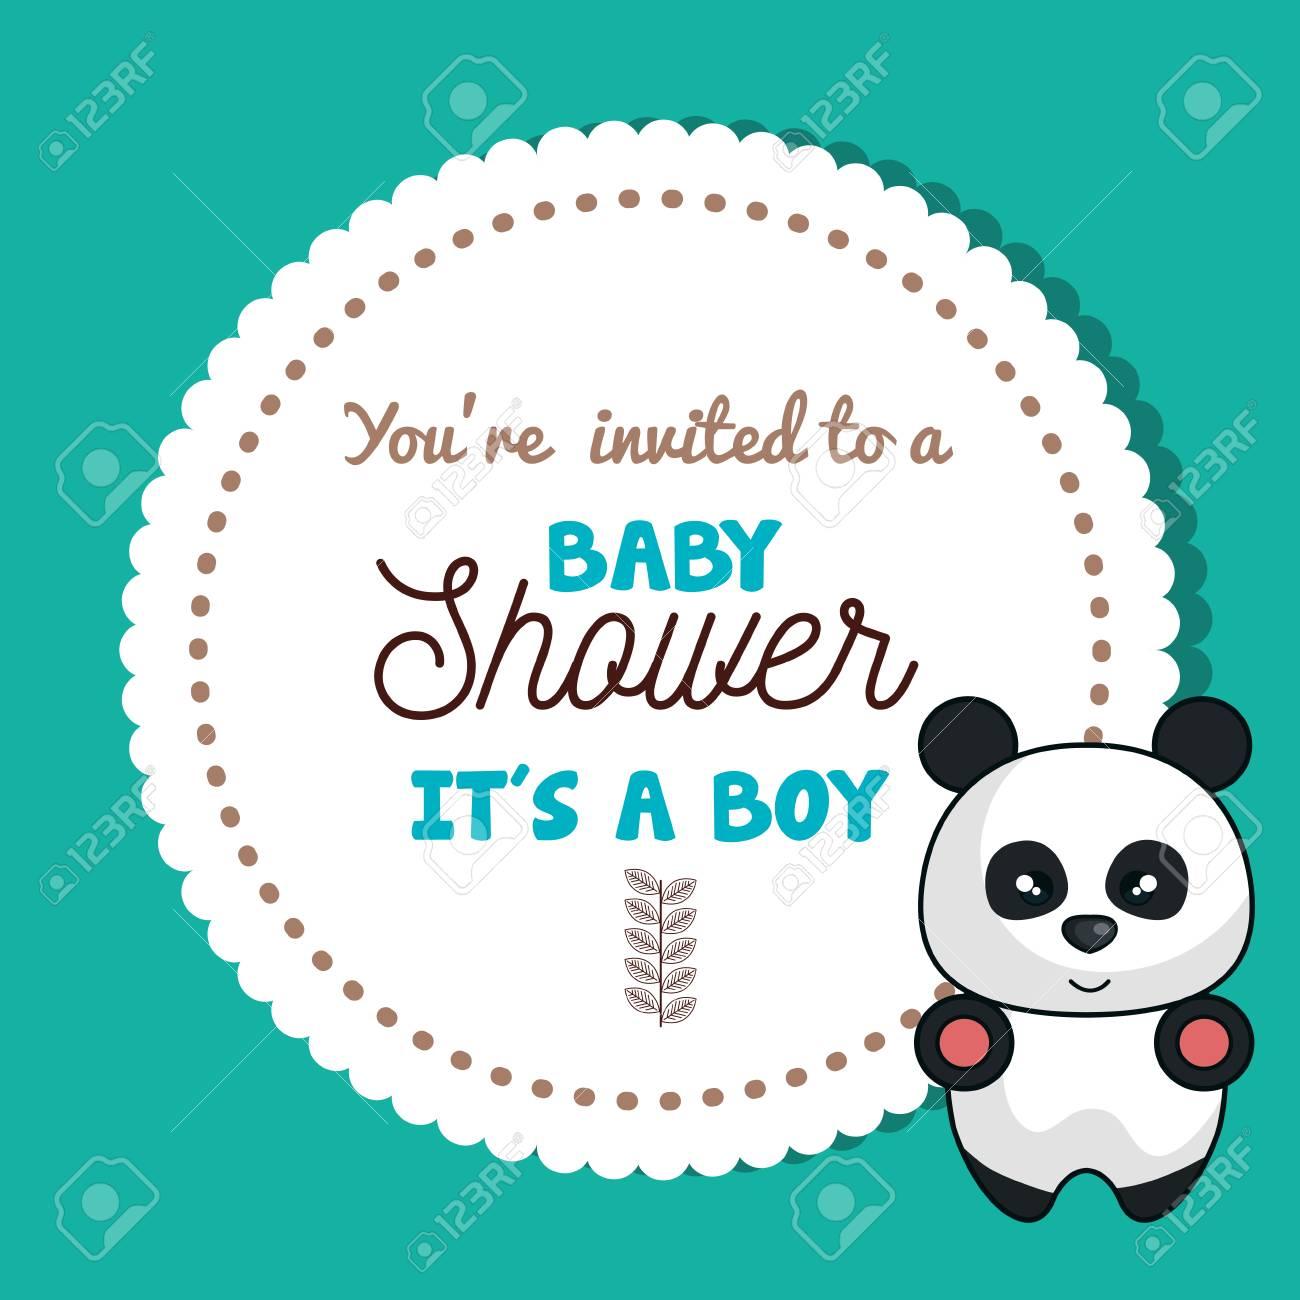 Baby shower invitation card with panda design vector illustration baby shower invitation card with panda design vector illustration eps 10 stock vector 62691123 filmwisefo